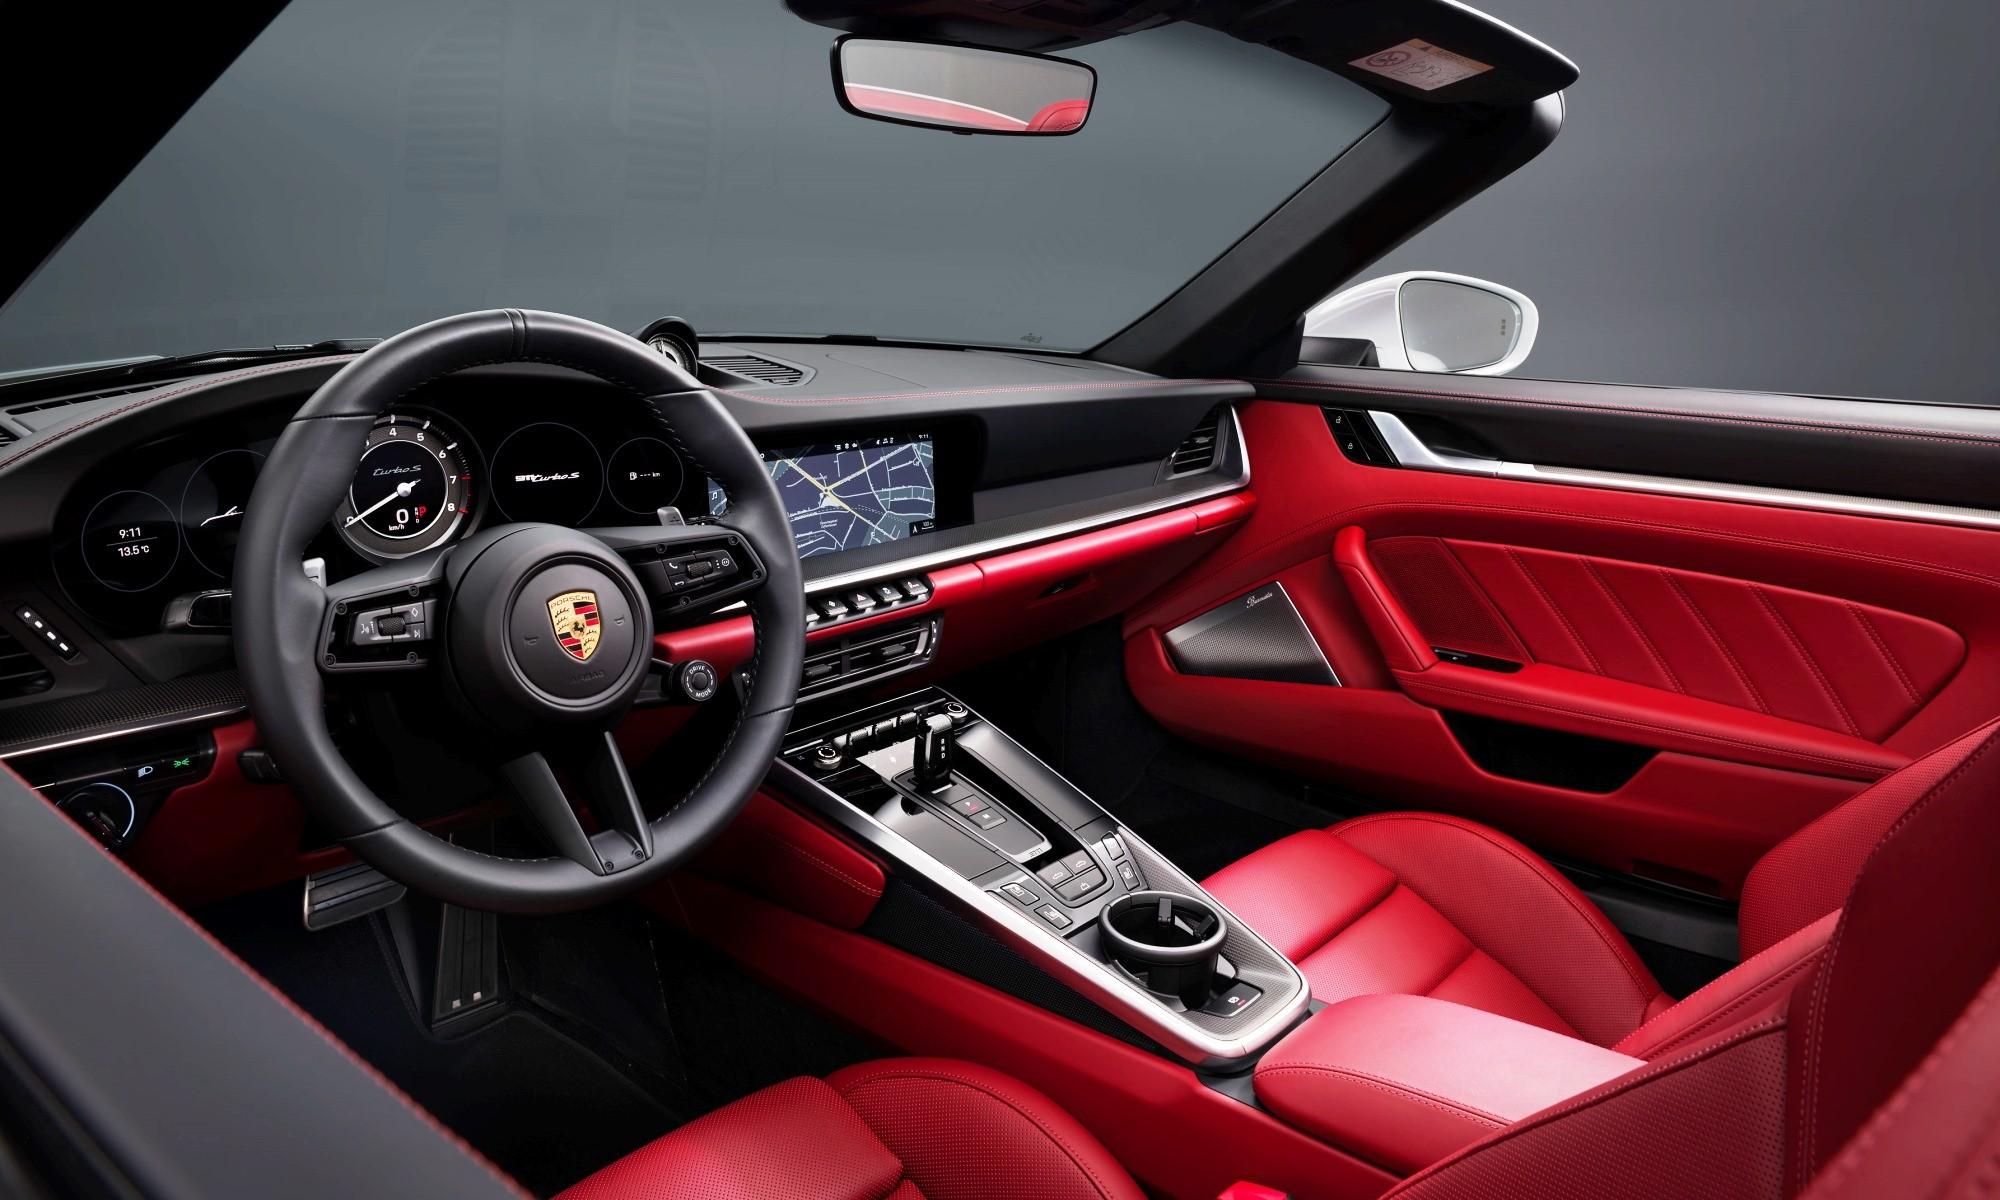 New Porsche 911 Turbo S interior